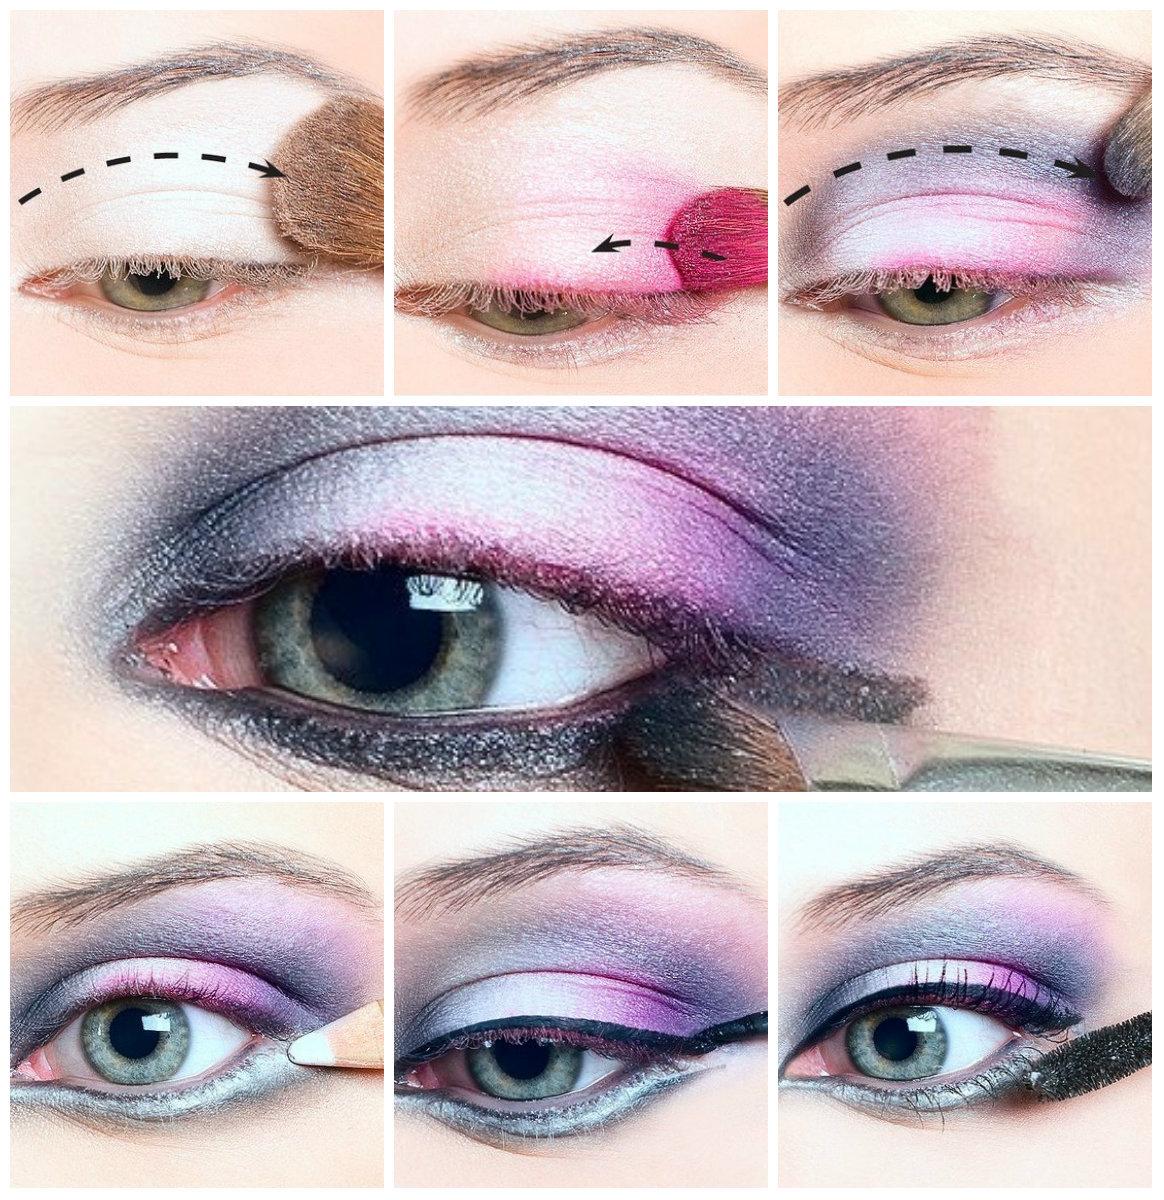 Макияж глаз с нависшим веком 16